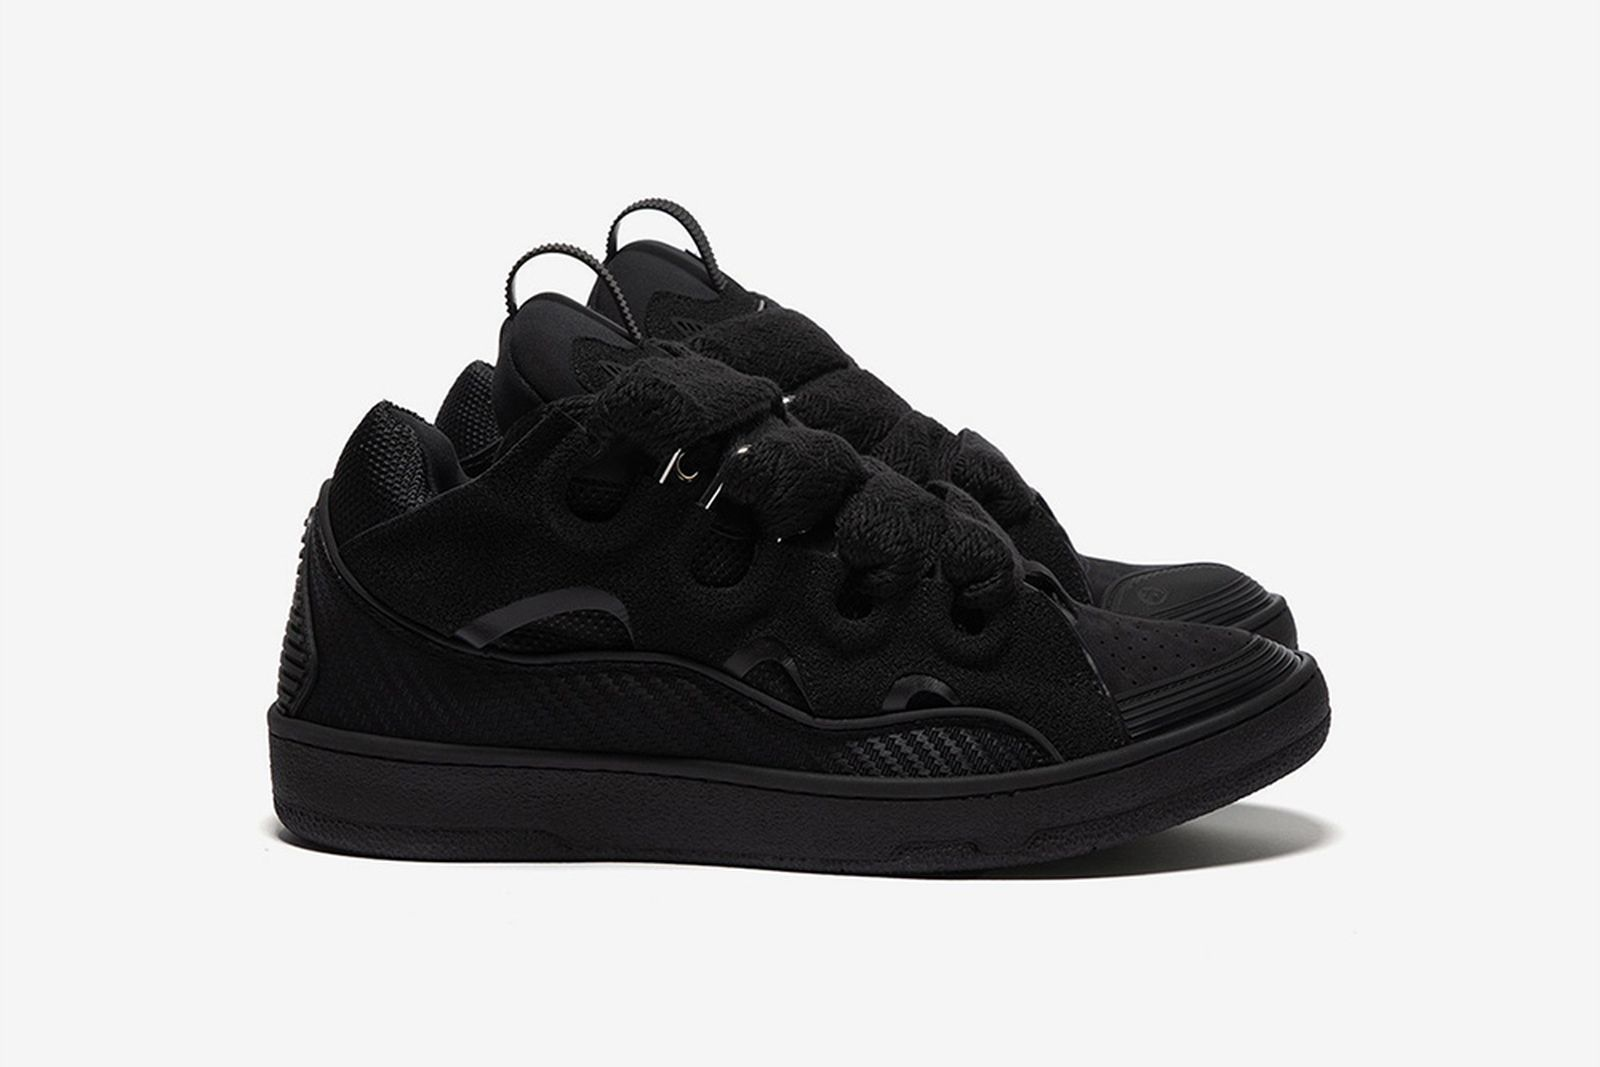 lanvin-curb-all-black-release-date-price-01